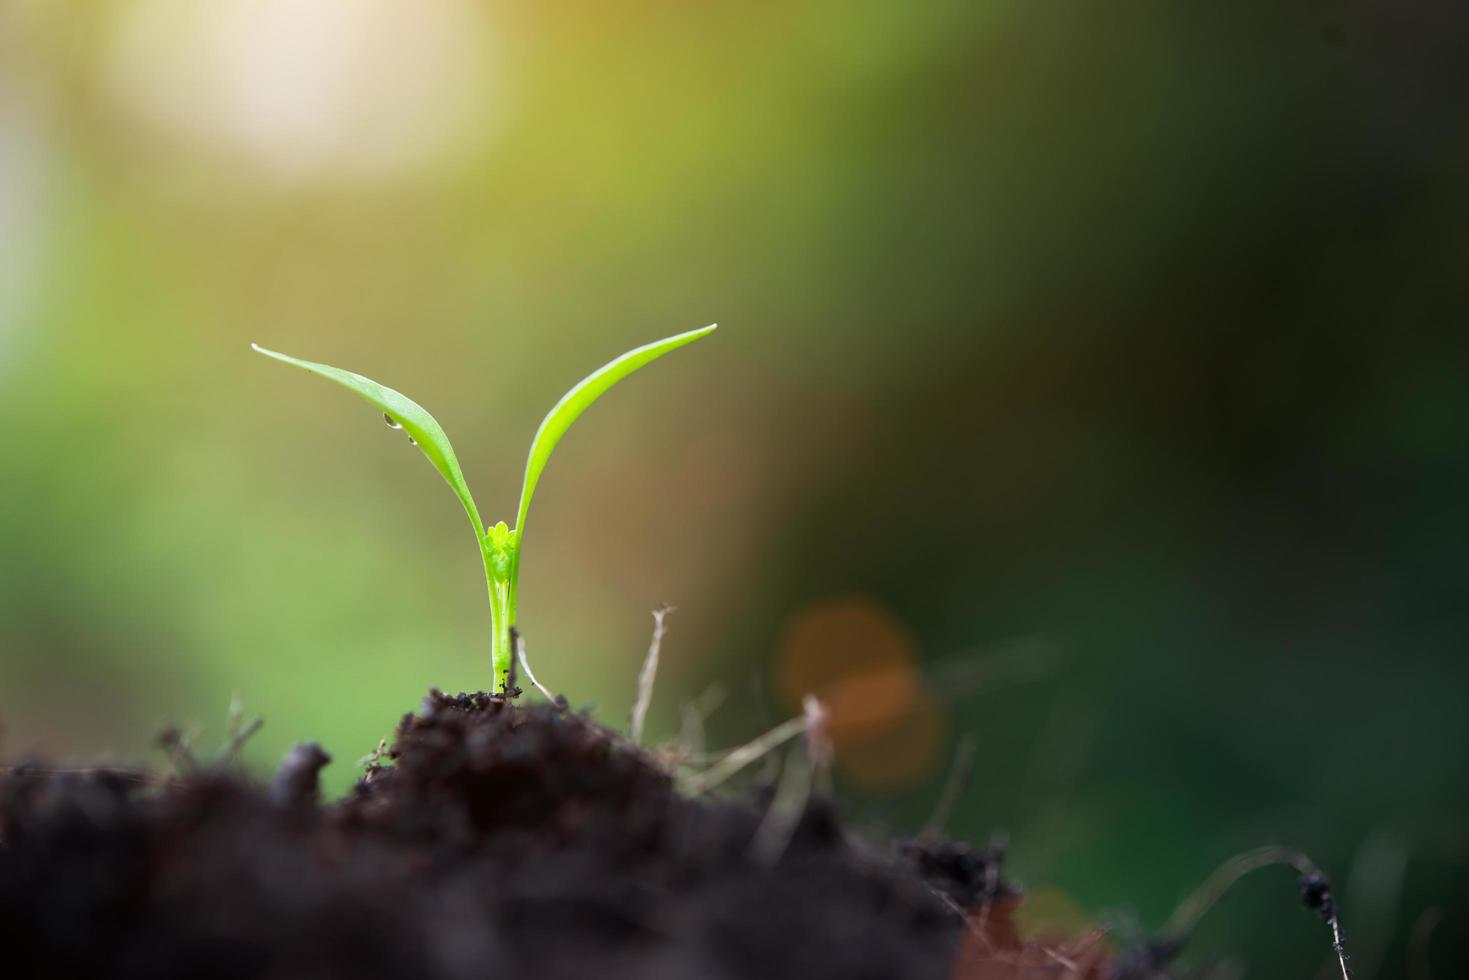 Cerrar planta brotando en la naturaleza foto